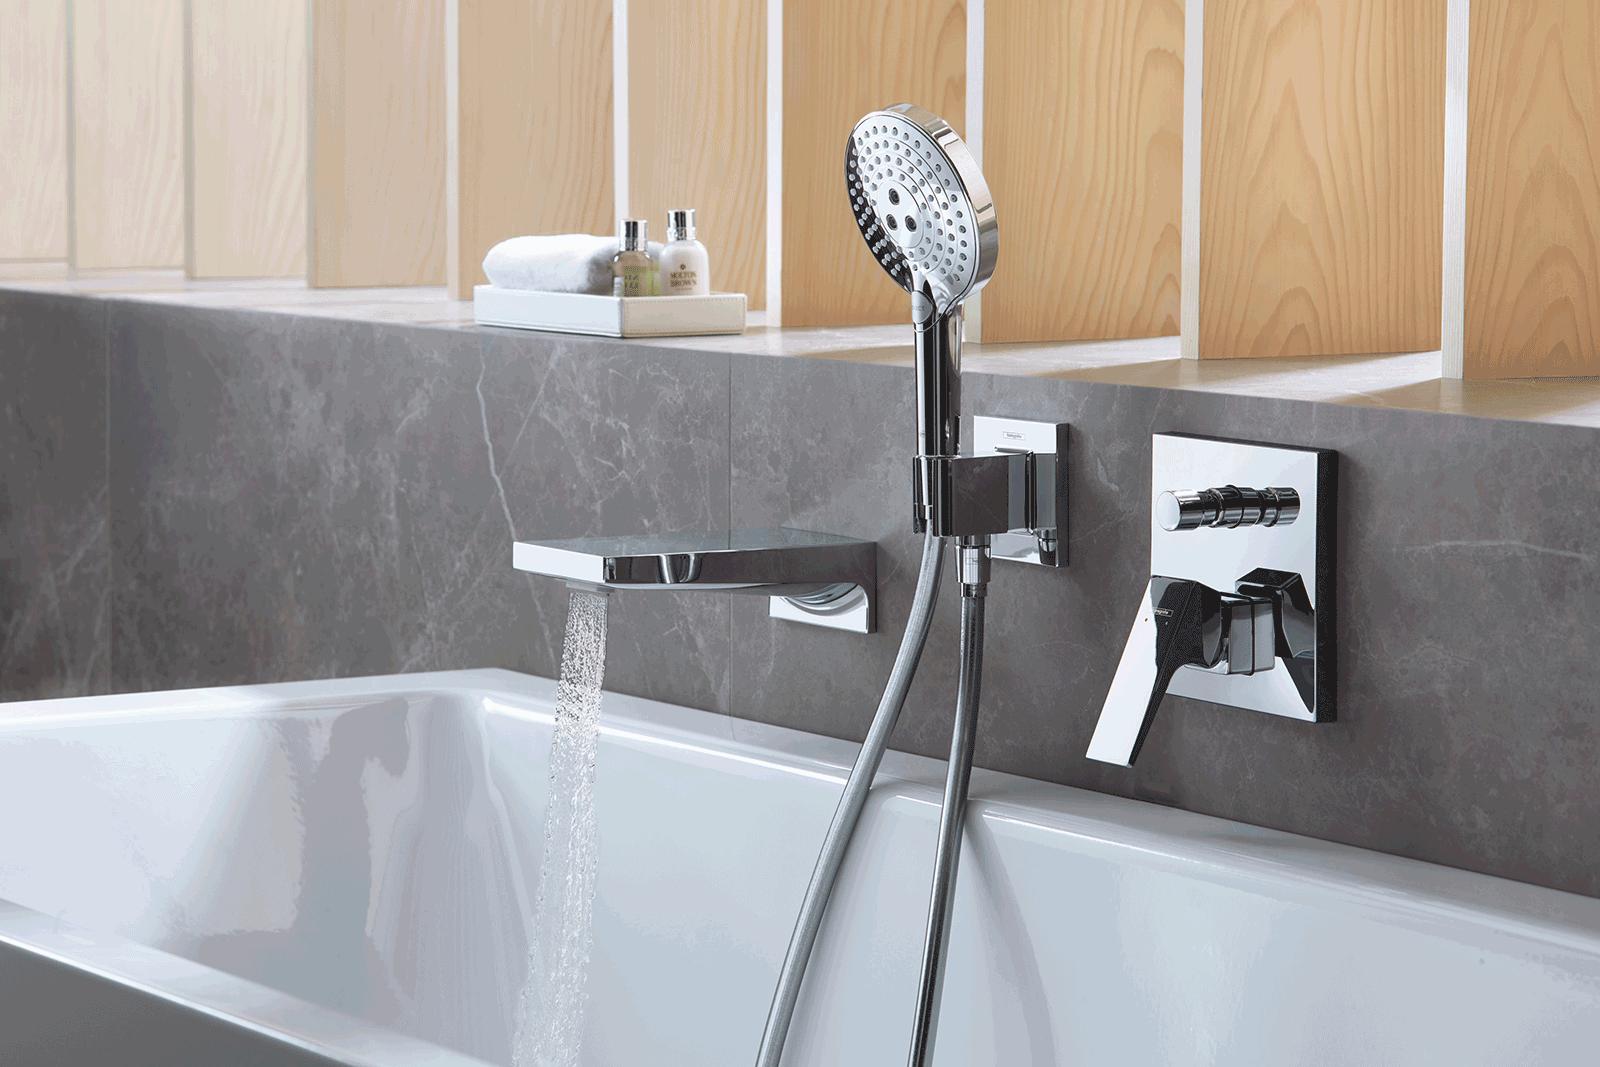 hansgrohe-bath-taps